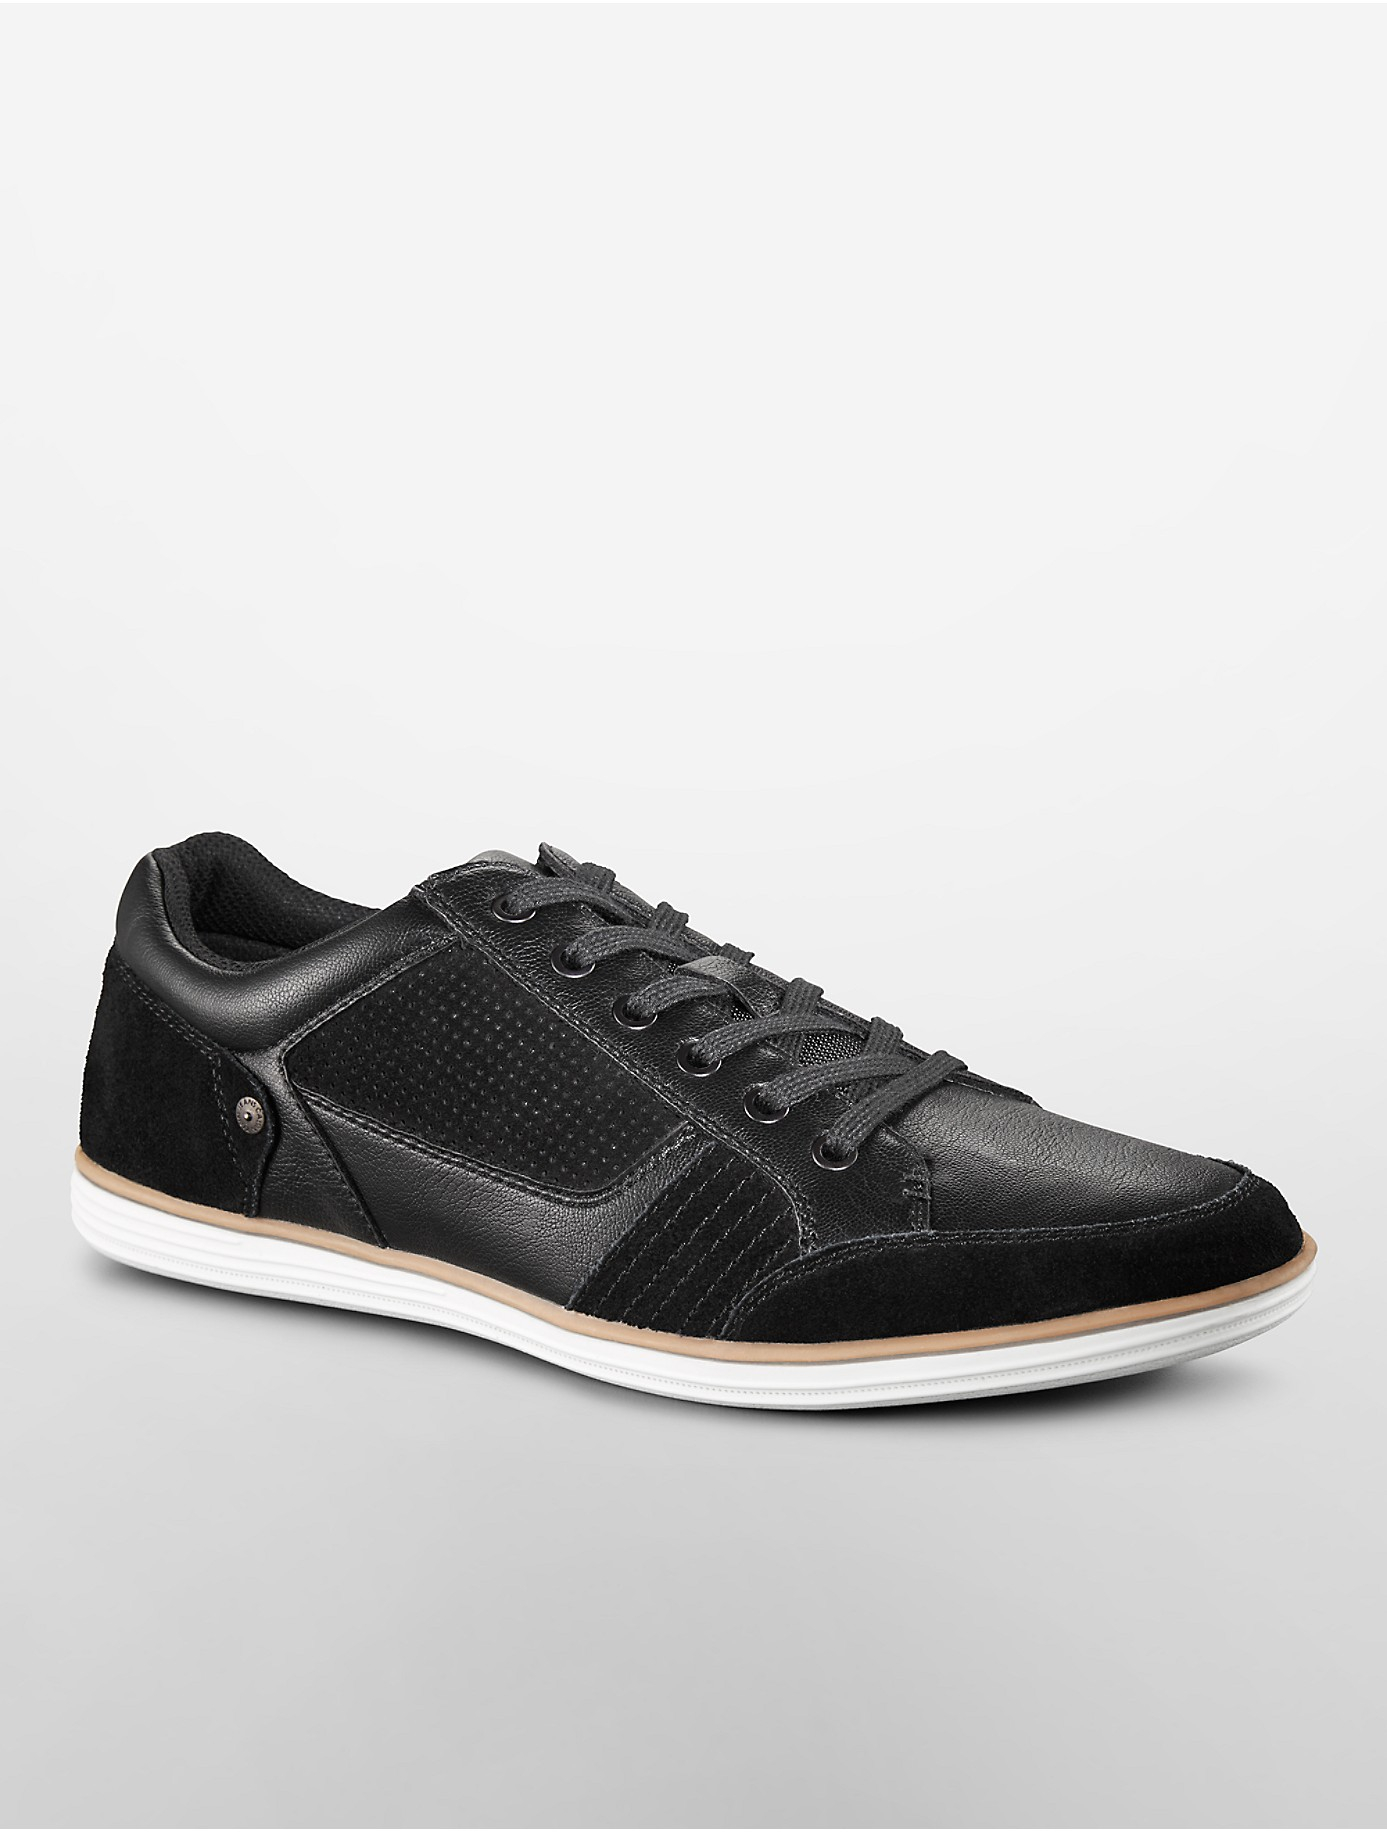 lyst calvin klein jeans scotty sneaker in black for men. Black Bedroom Furniture Sets. Home Design Ideas